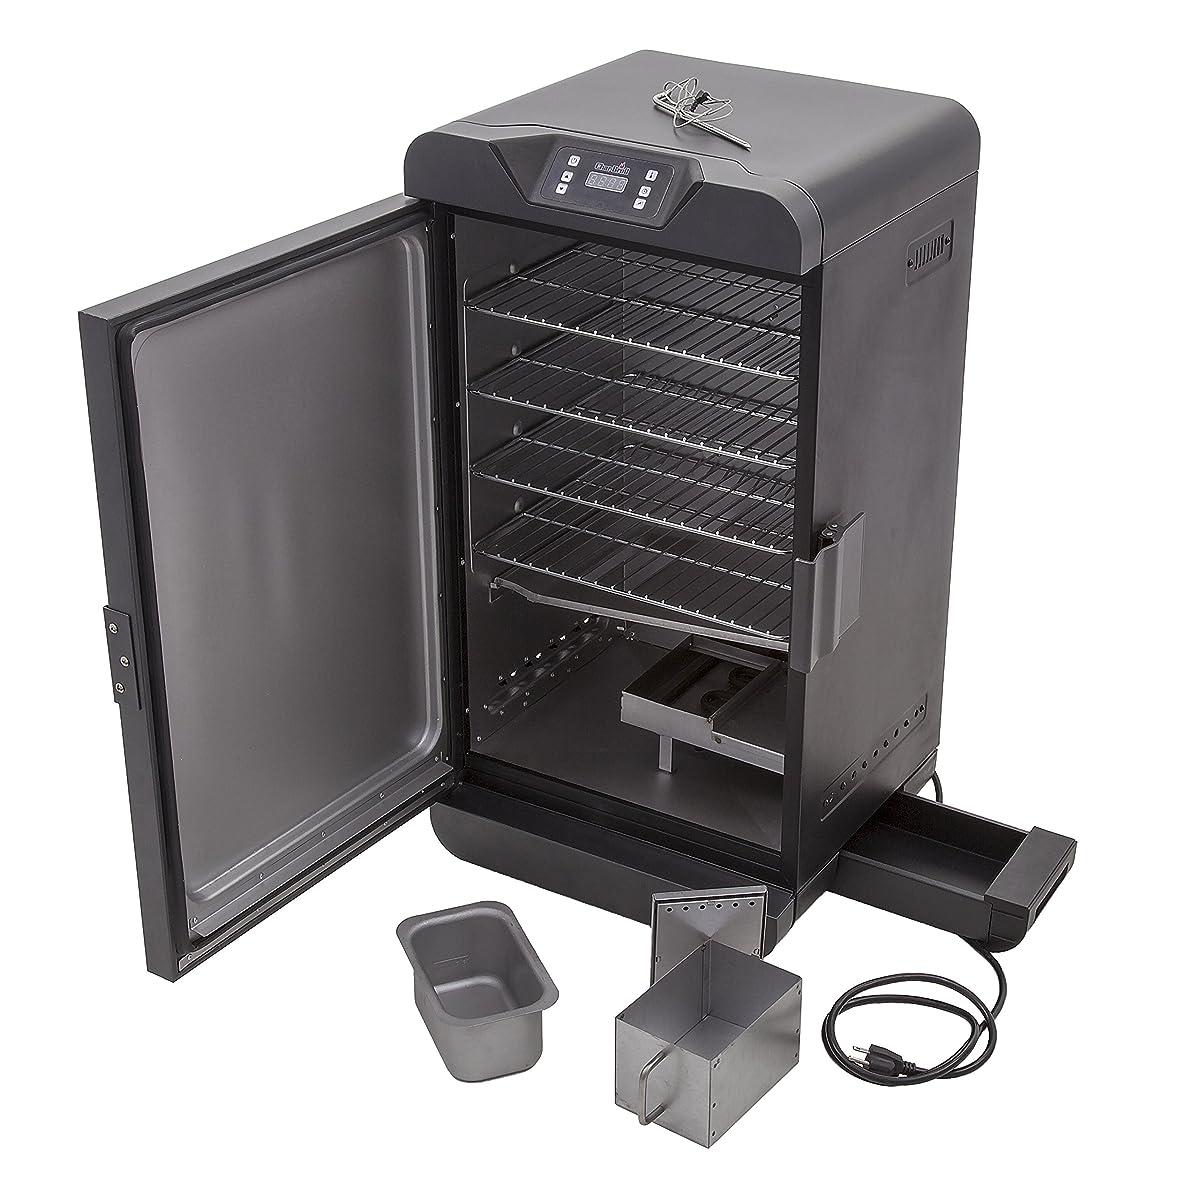 Char-Broil Standard Digital Electric Smoker, 725 Square Inch